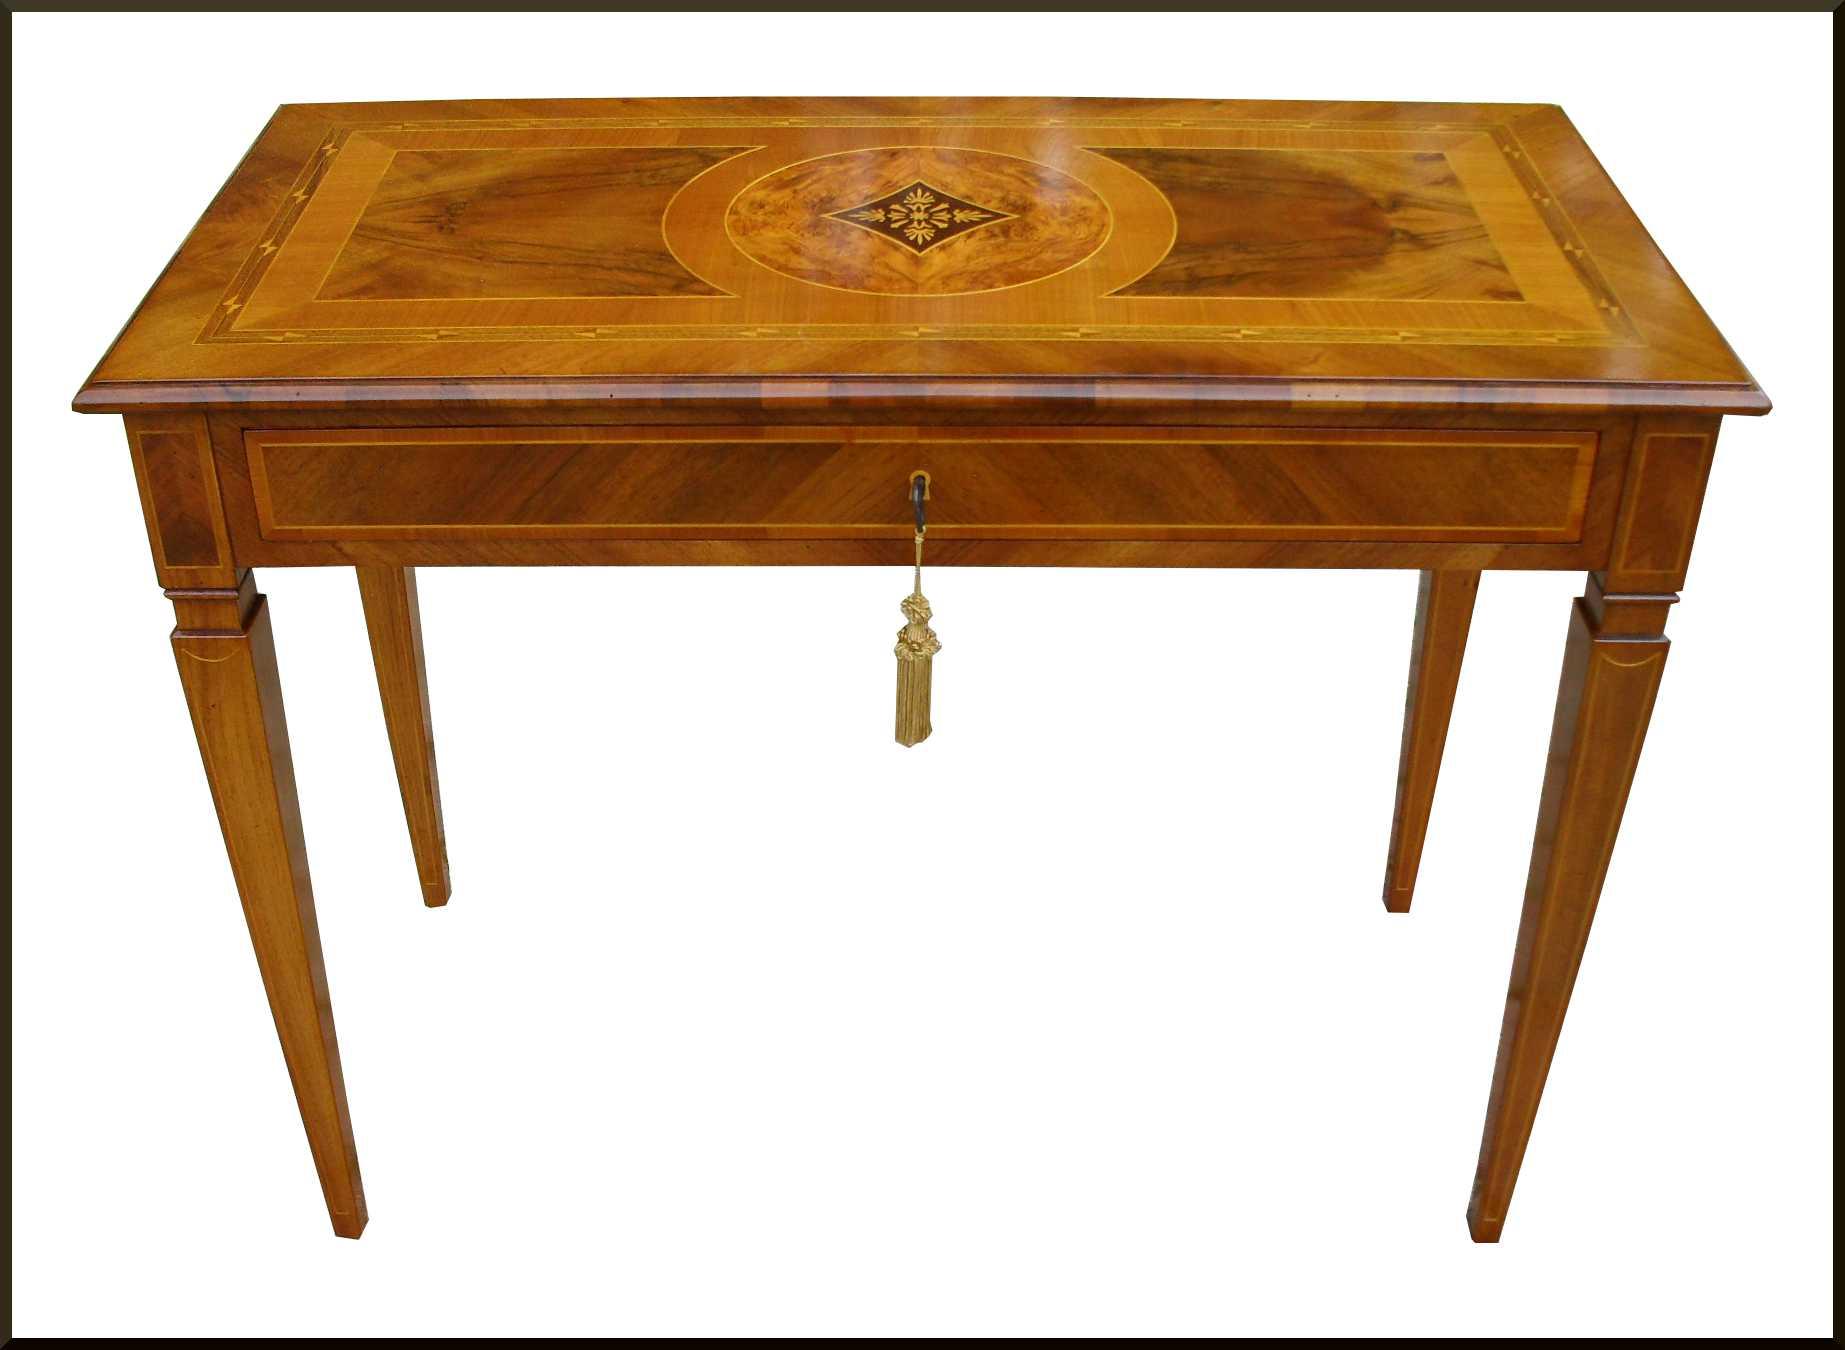 Novit e promozioni mobili antichi restaurati e for Cerco mobili antichi